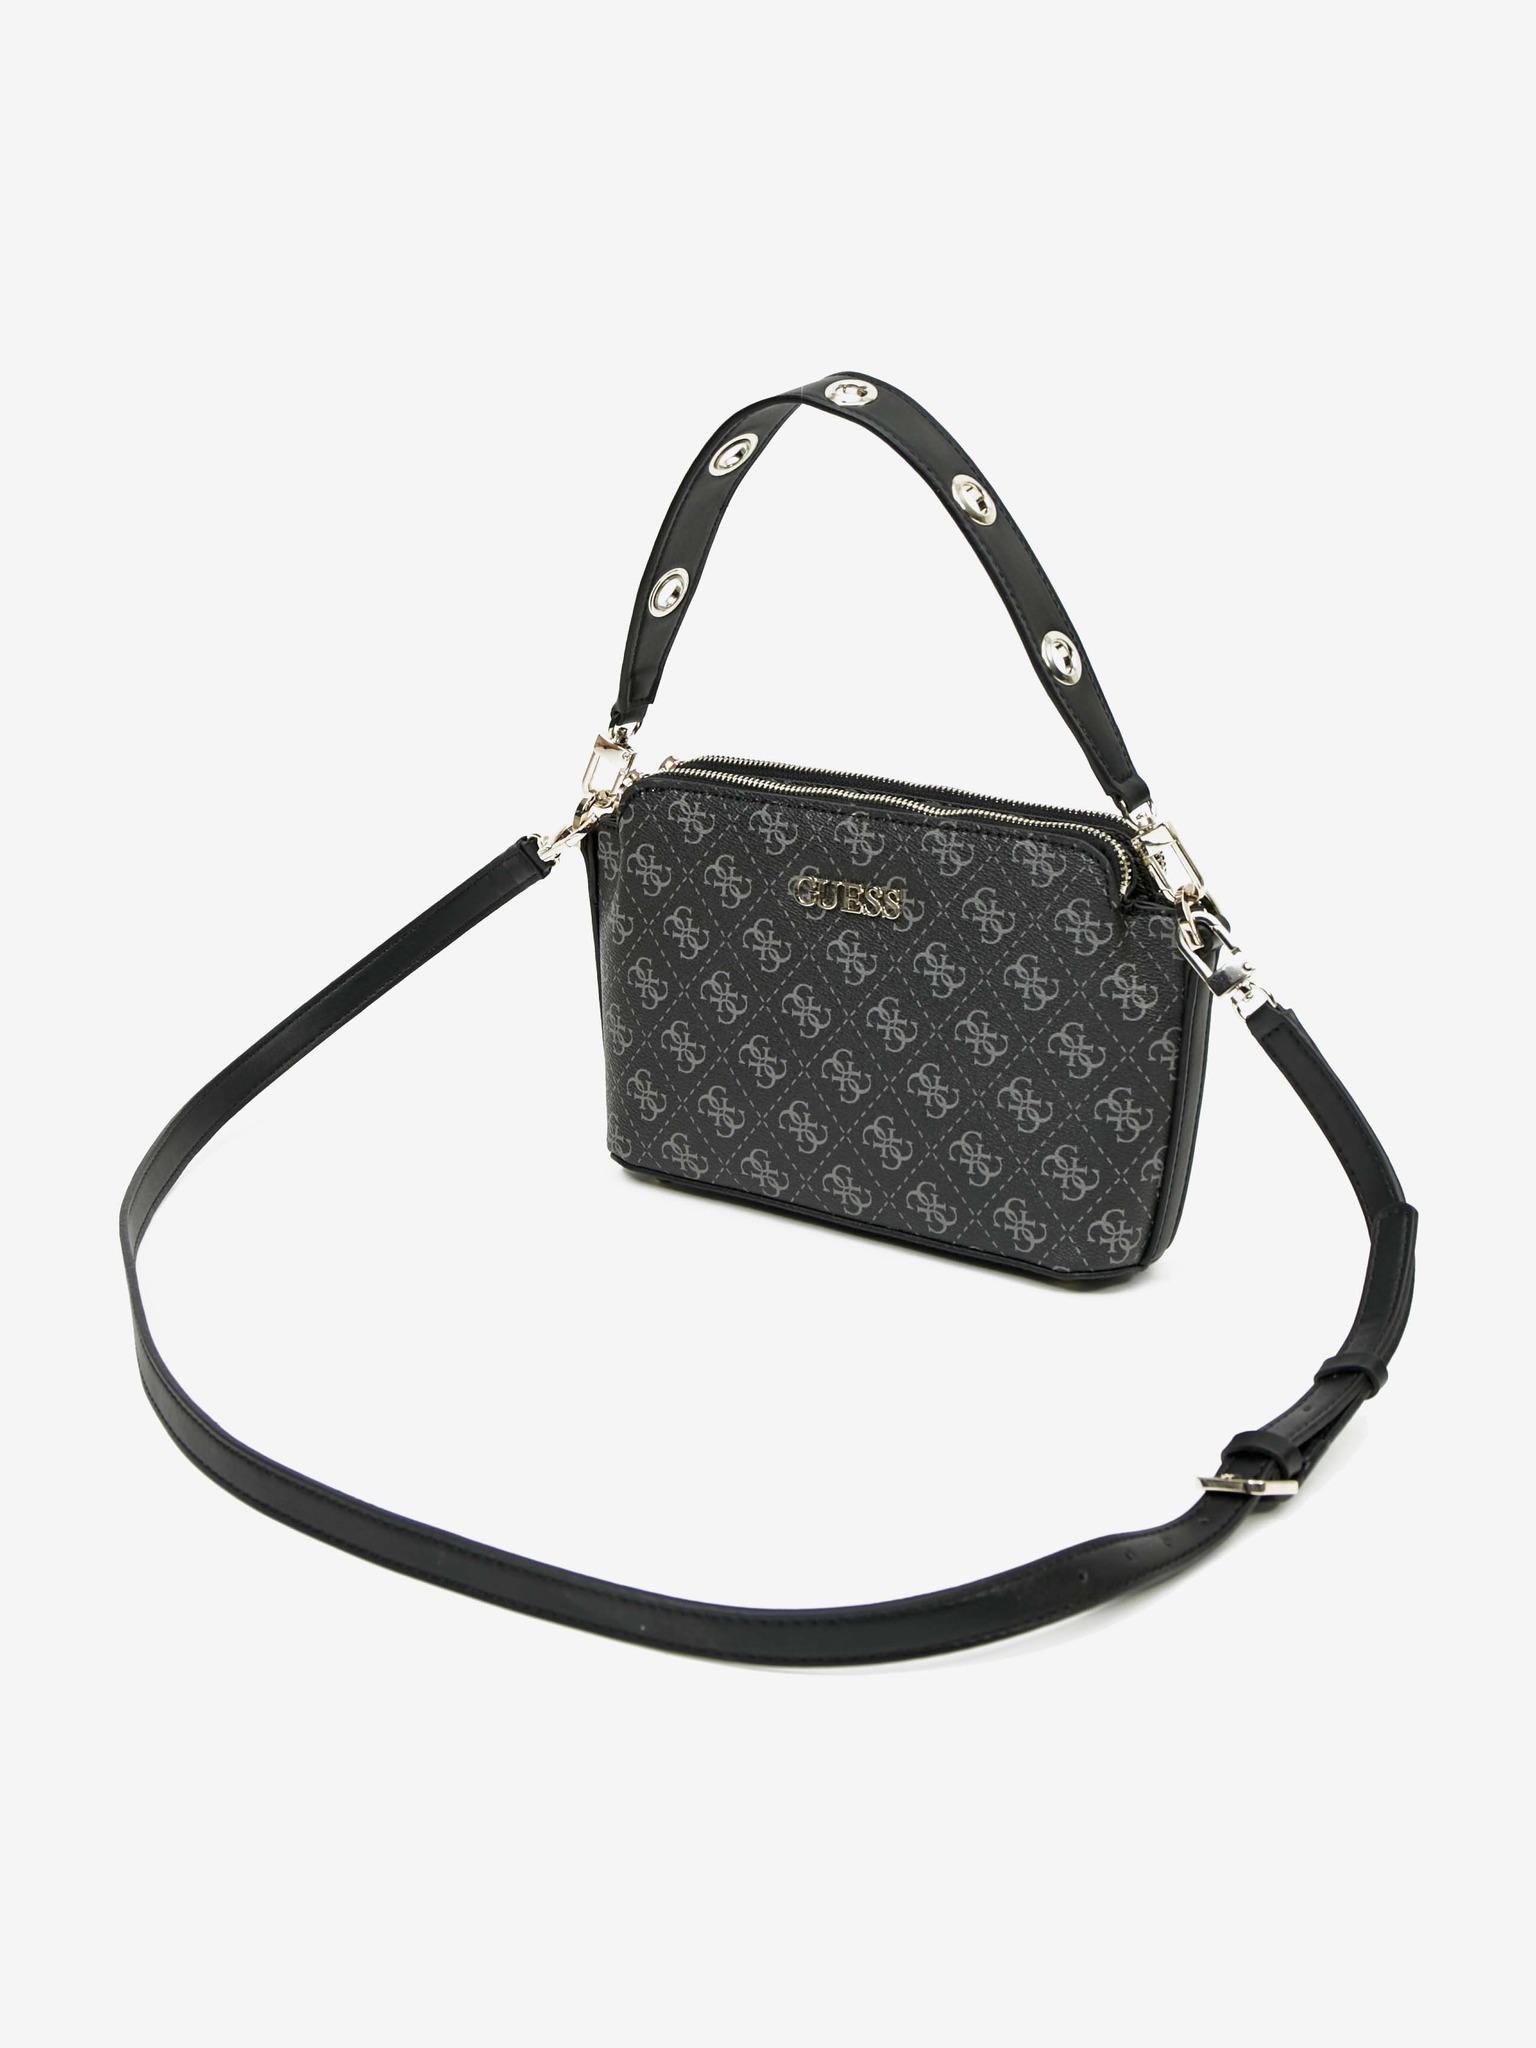 Guess black handbag Washington